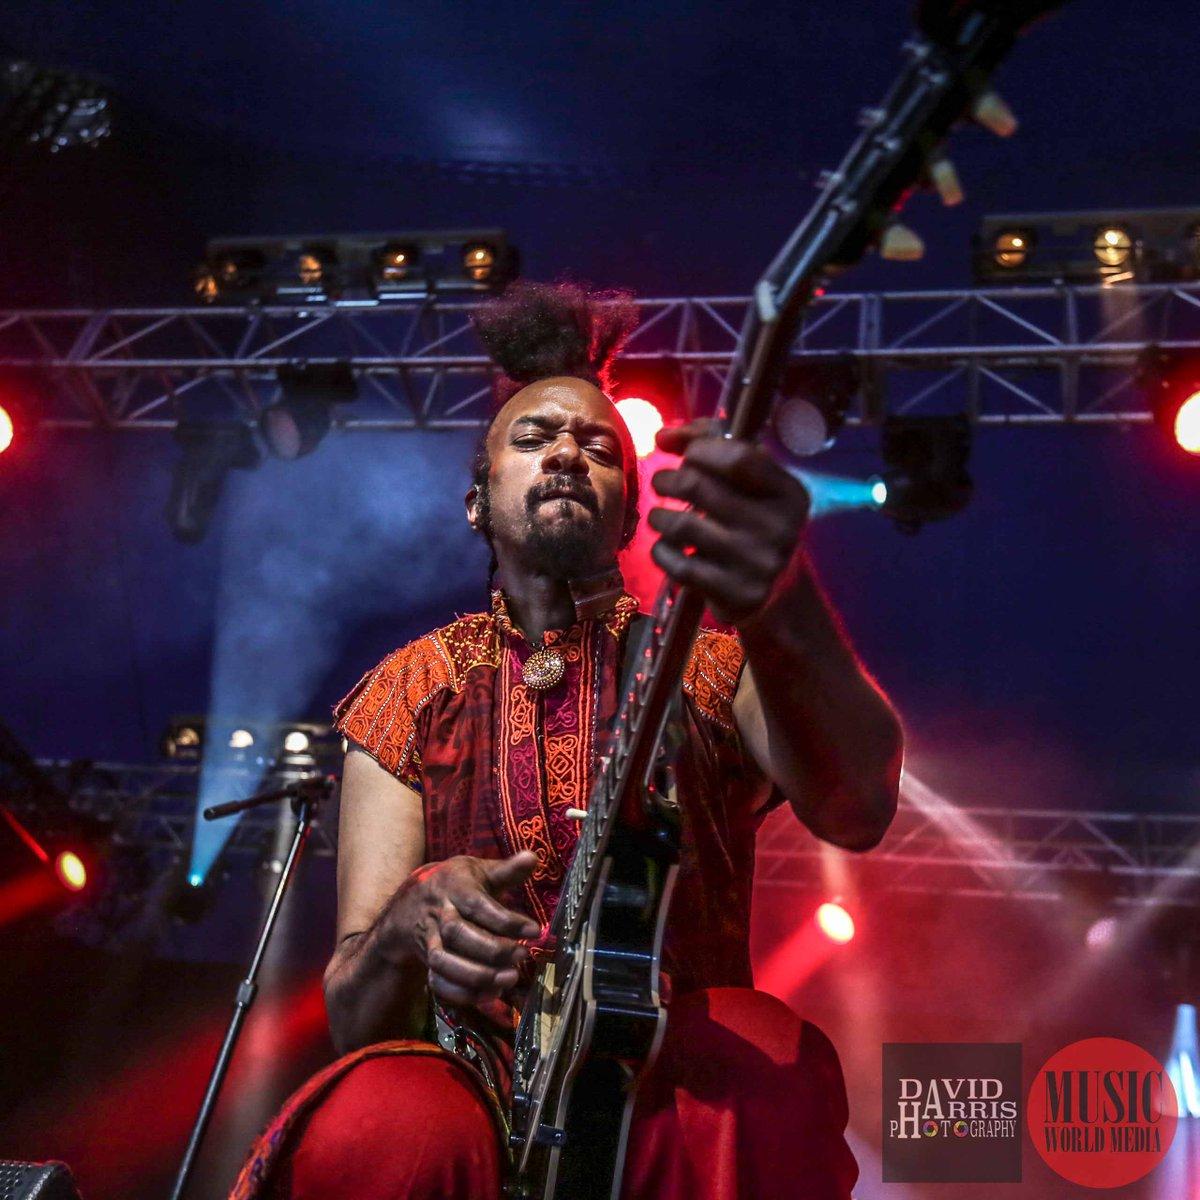 Fantastic Negrito @BluesfestByron @davidharrispics @MusicNegrito @musicworldmedia #australianmusic #internationalmusic #musicfestival #music #livemusic #blues  #festival #bluesmusic #americanamusic #americana #soulmusic #byronbay #bbbf19